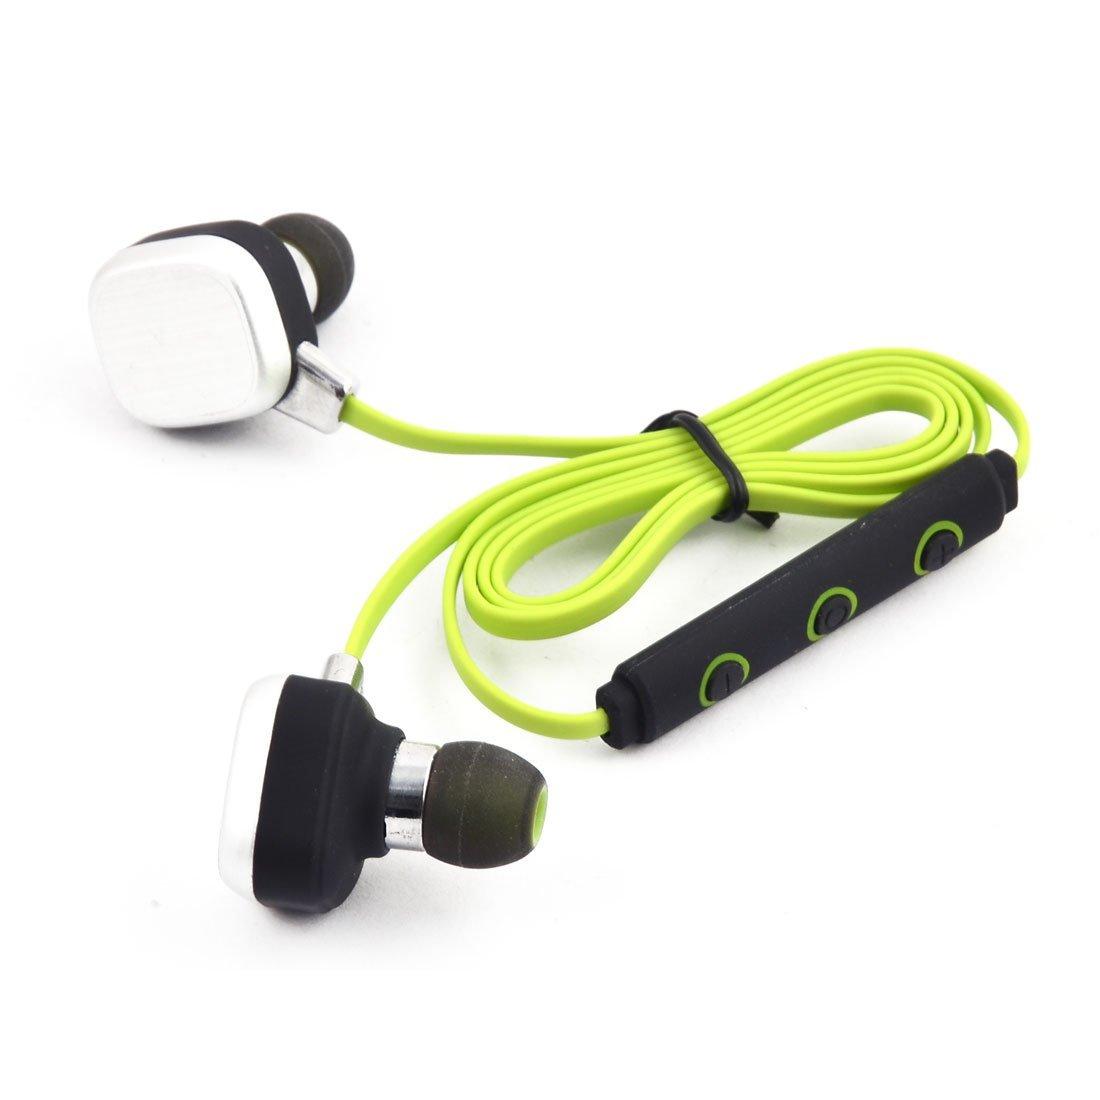 Amazon.com: eDealMax Estéreo Aire Libre Deporte Teléfono inalámbrico en la oreja de cancelación de ruido Auricular Bluetooth Verde: Electronics